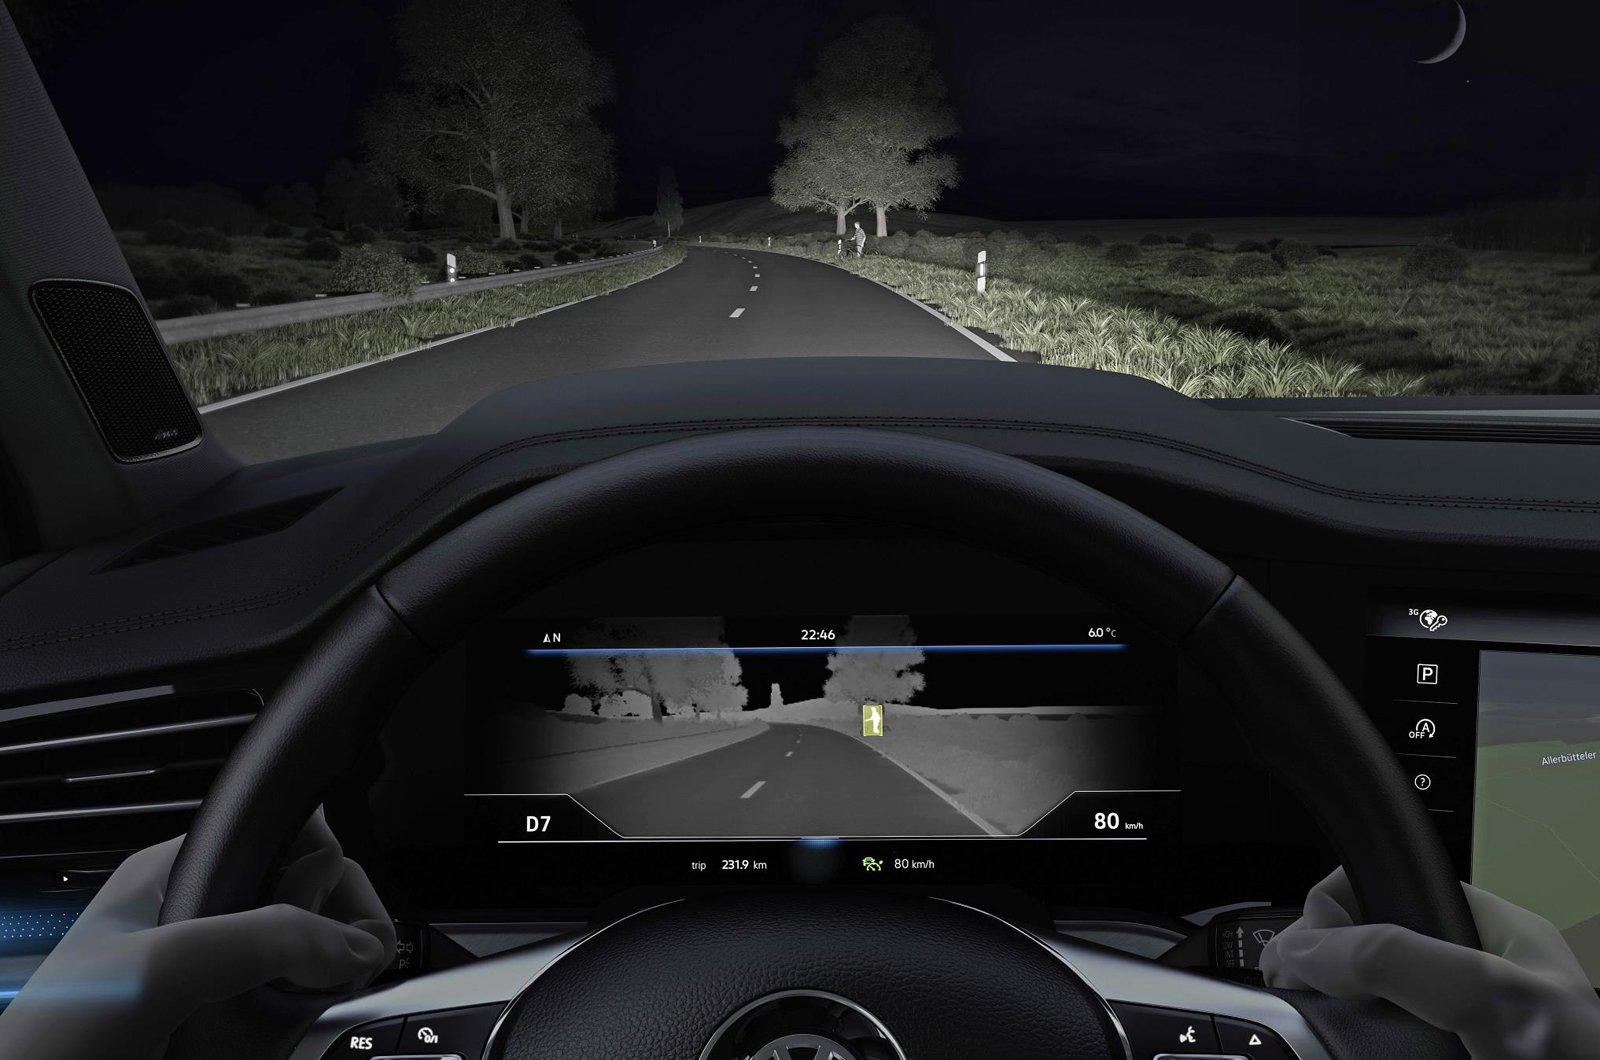 Volkswagen Touareg night vision